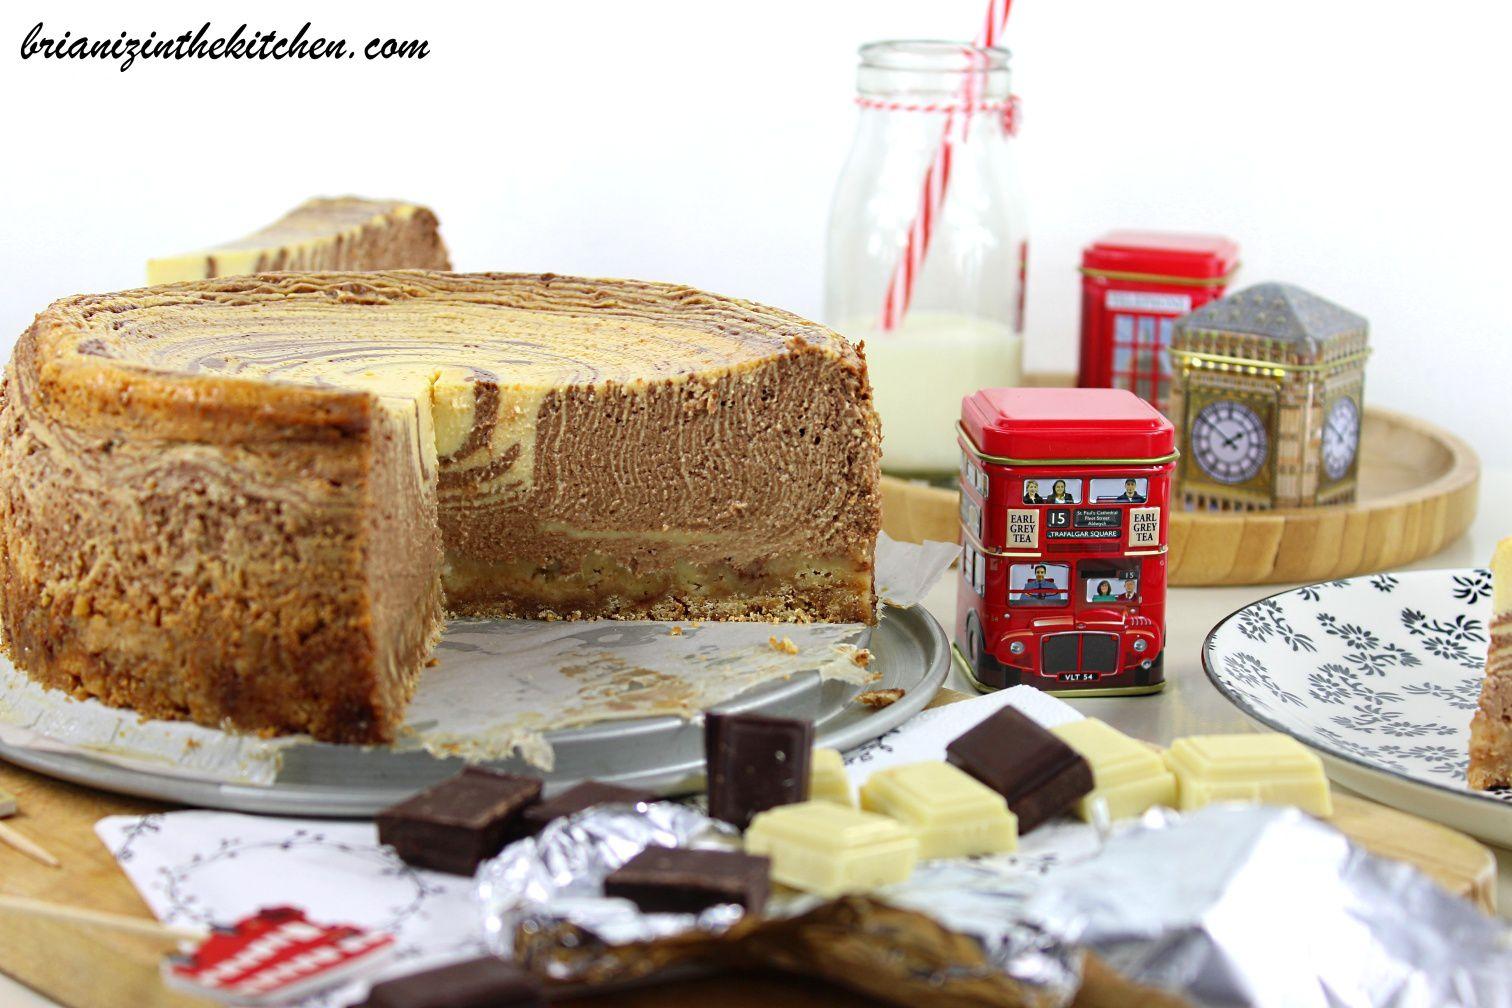 Zebra Cheesecake aux Deux Chocolats